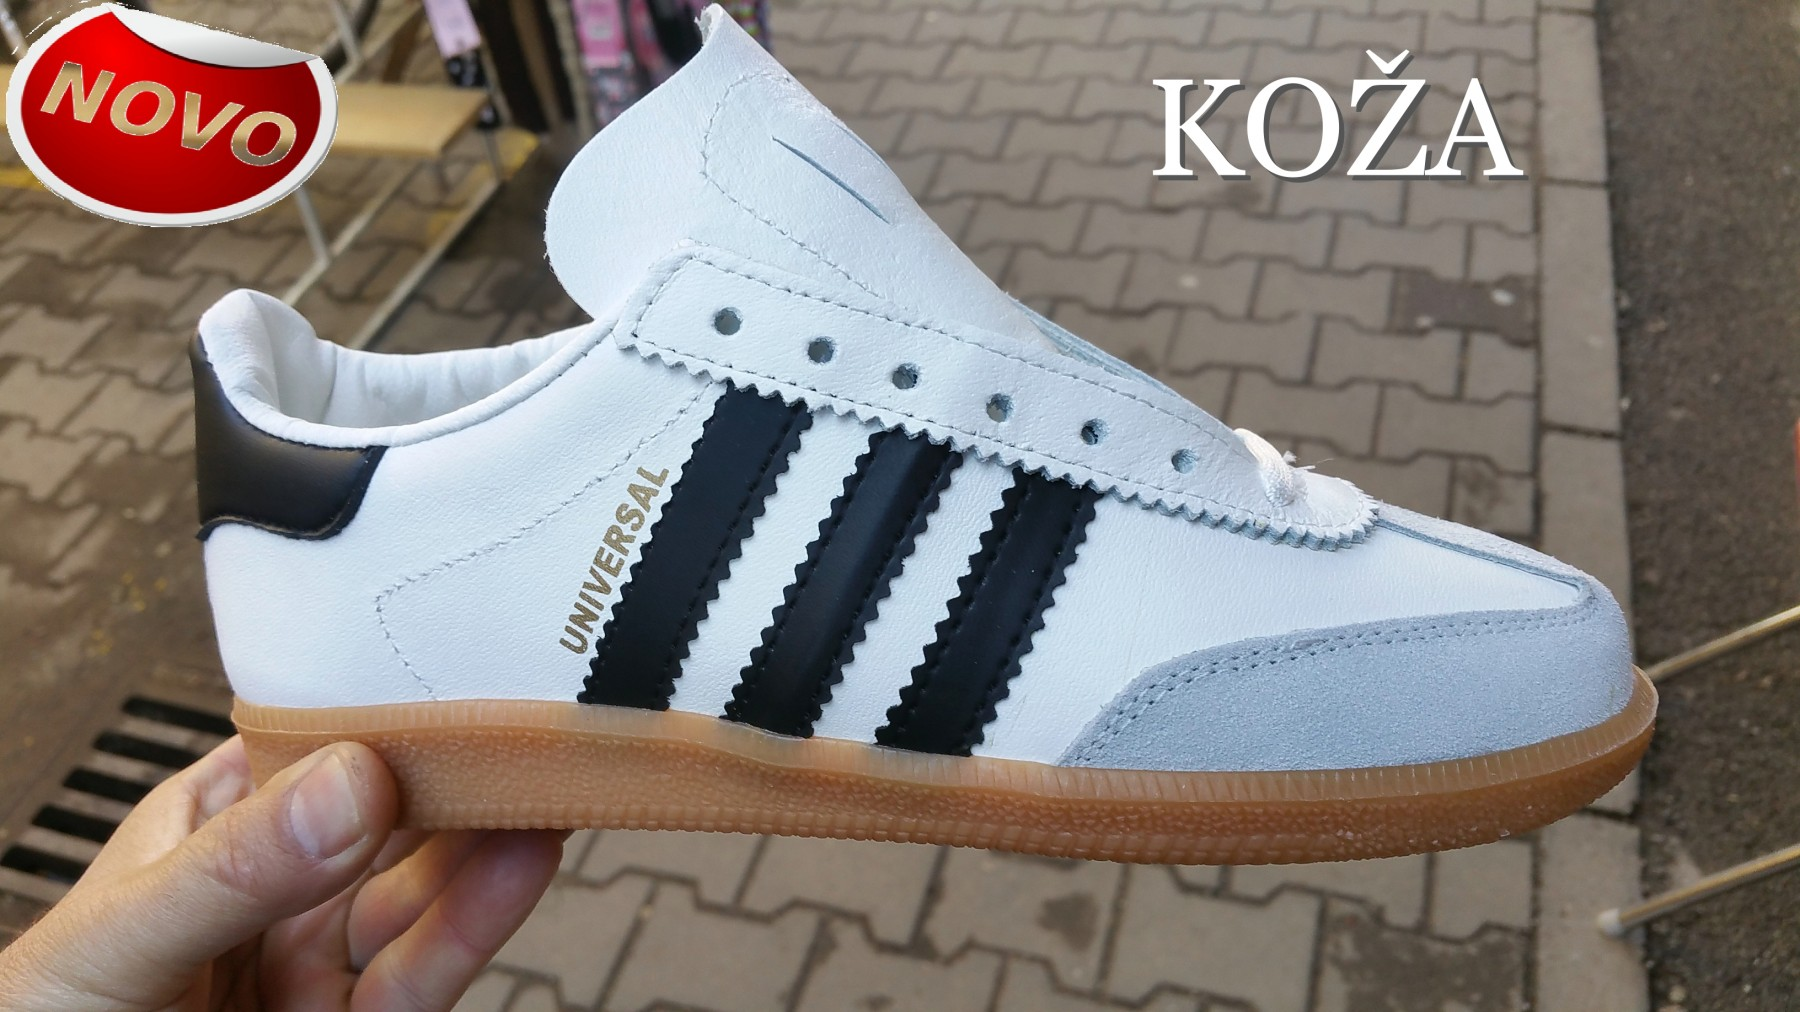 Adidas Universal Patike, Kozne, brojevi 39-47 NOVO